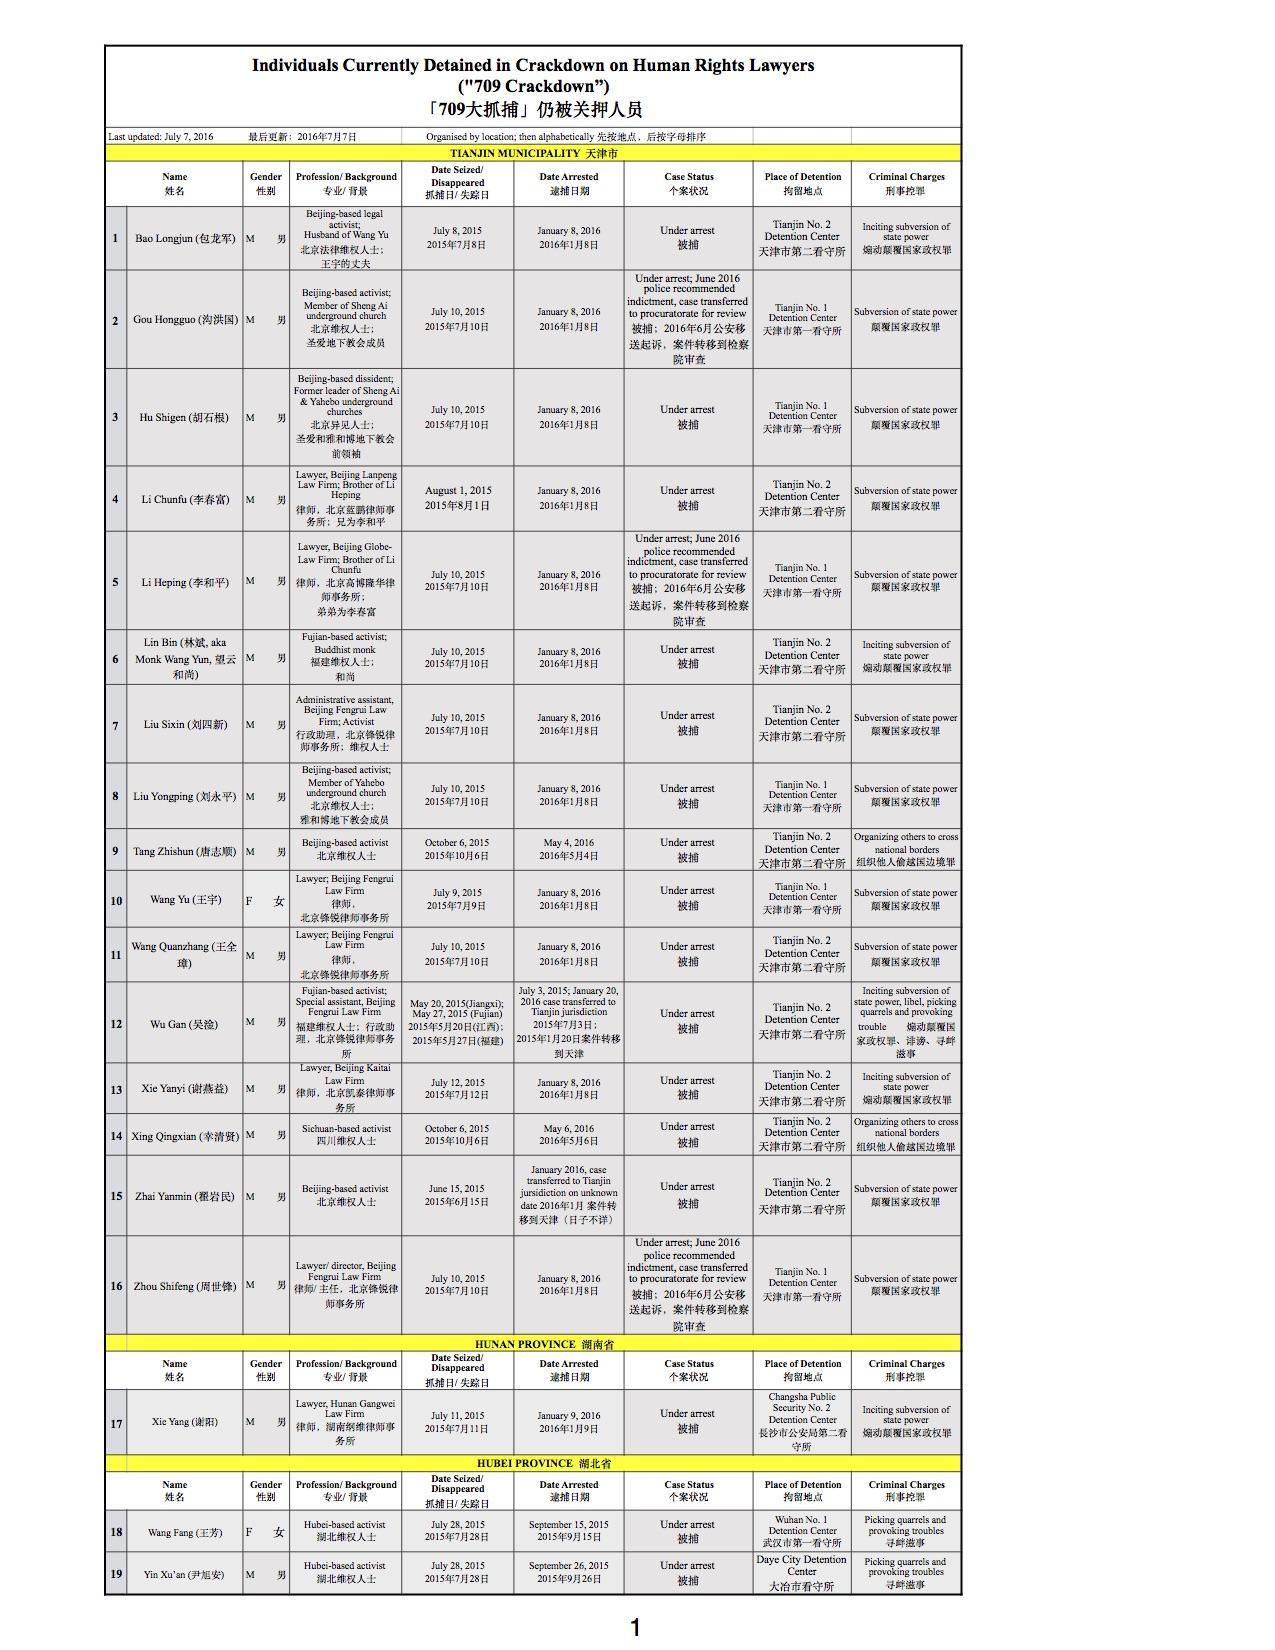 709 crackdown chart image_July 7 Bilingual (1)